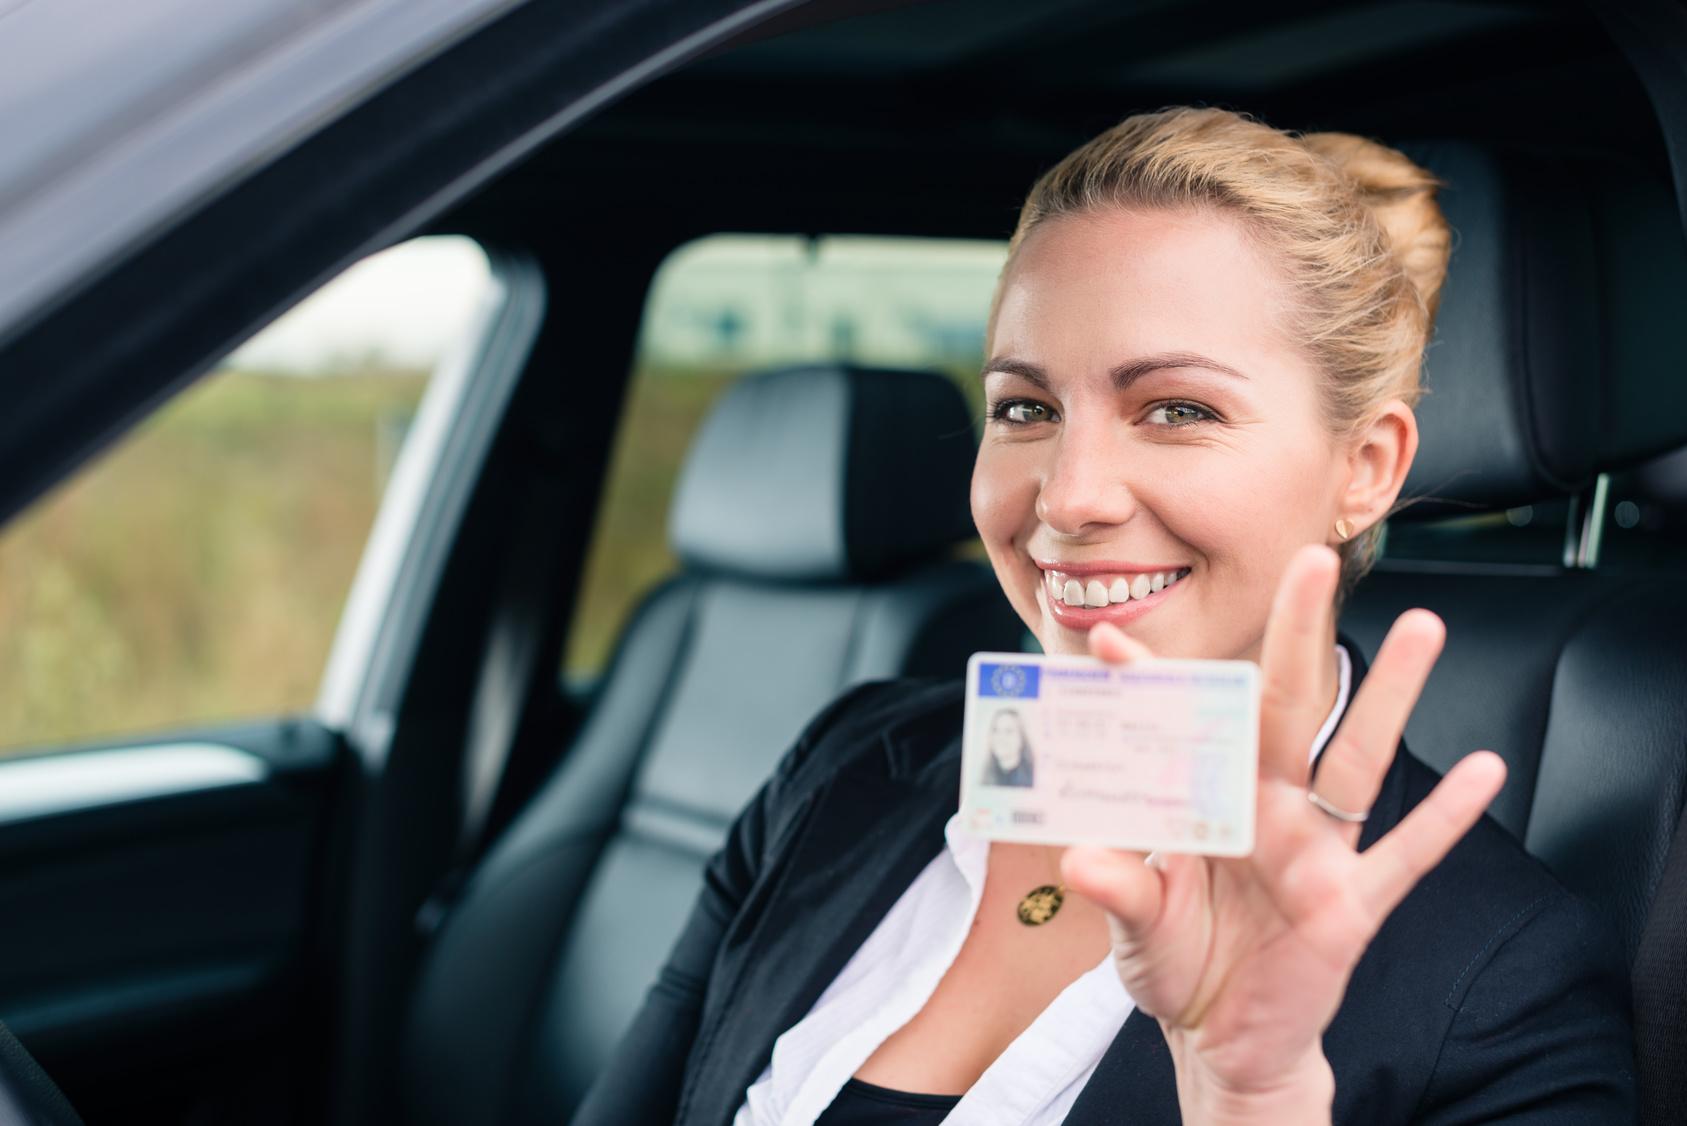 B-ajokortin perusvaihe 899€ (arvo 1150€)